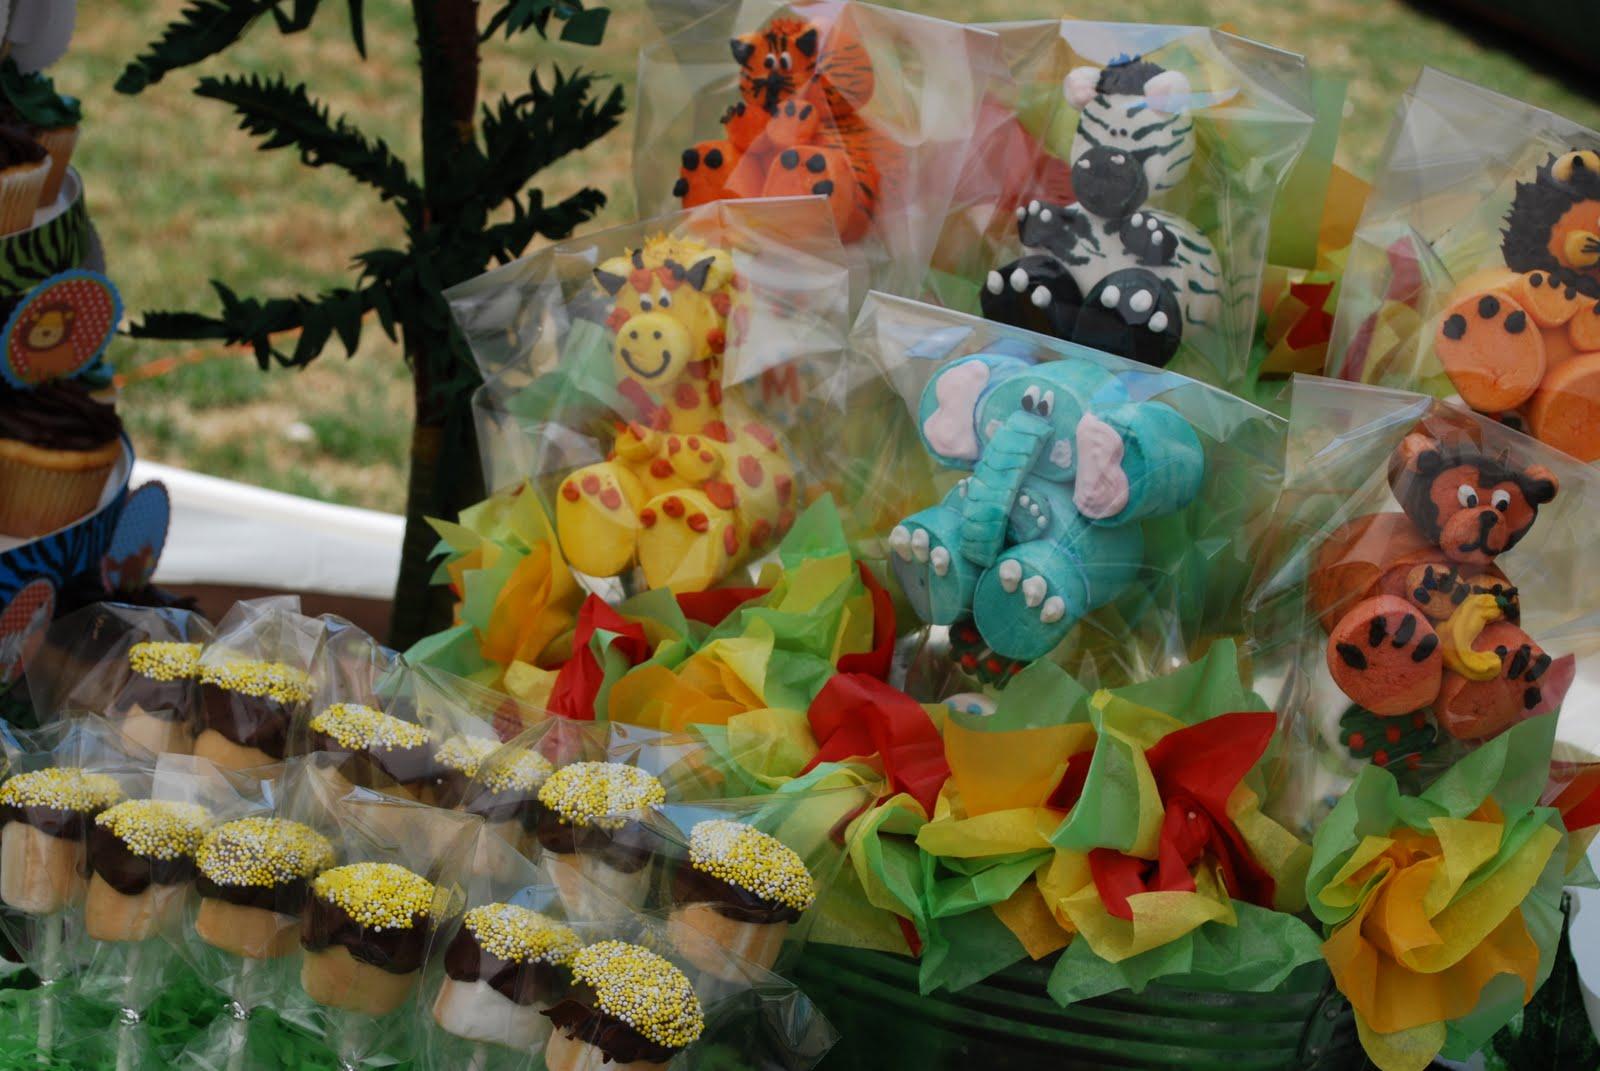 12 Fillable Bottles Baby Shower Favors Prizes Games Safari ... |Safari Animal Baby Shower Favors